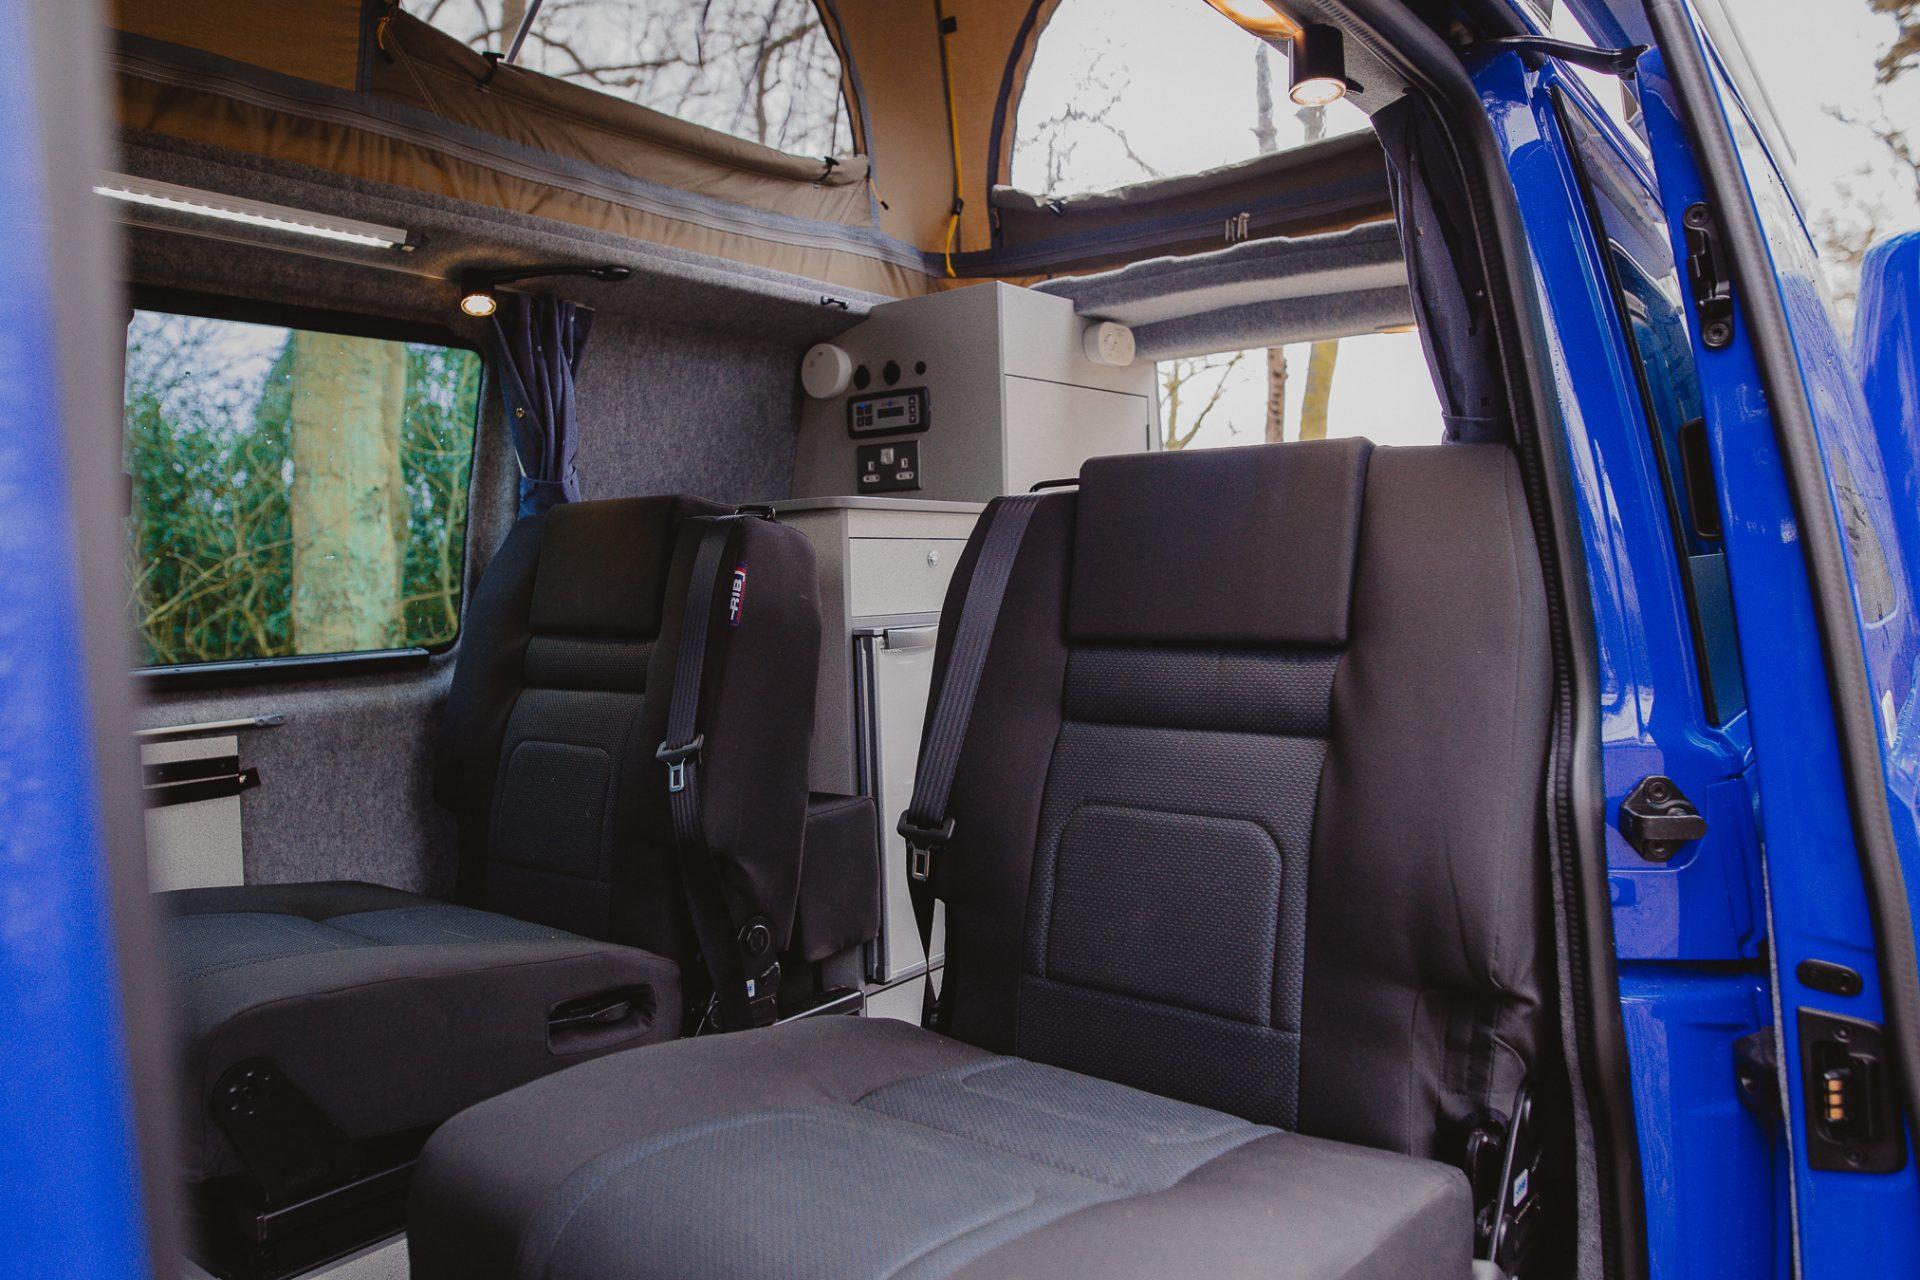 Campervan Interior - Black seats in the back